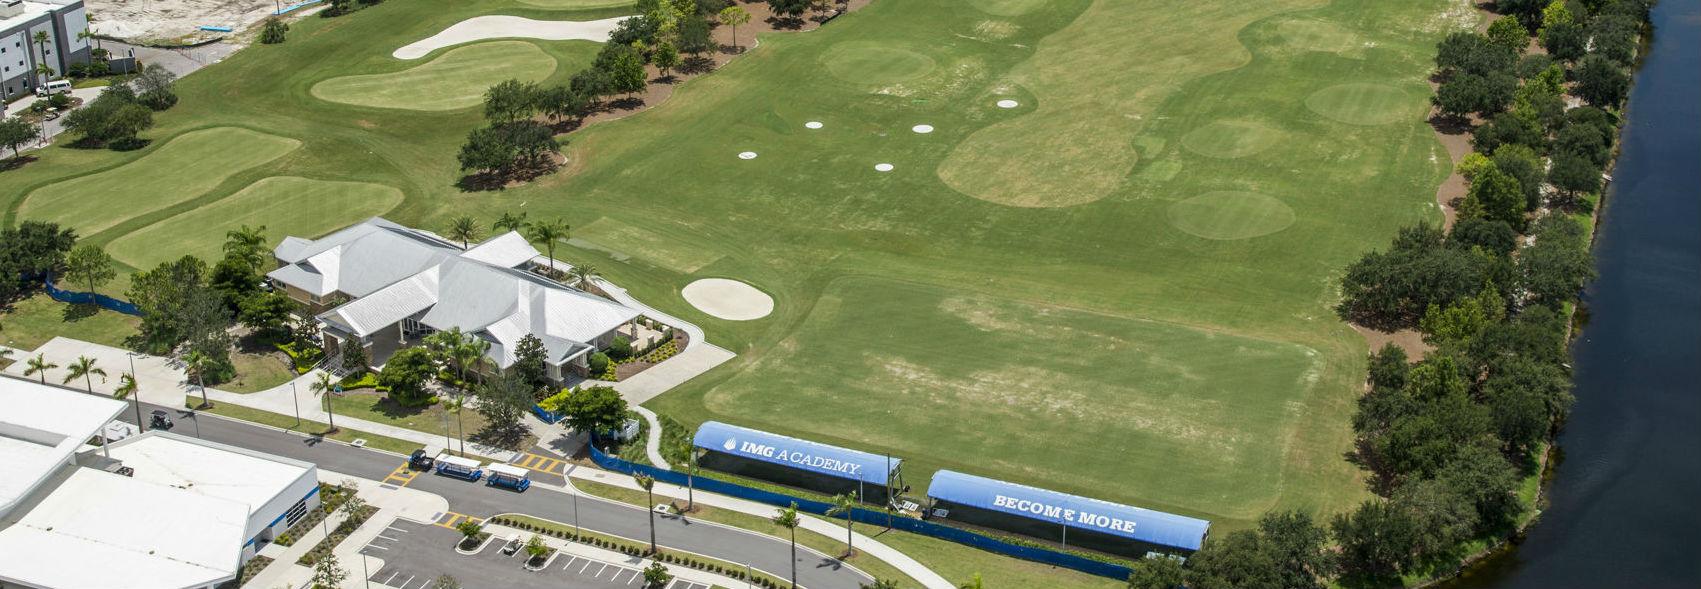 IMG-Golf-08-09-1704-2